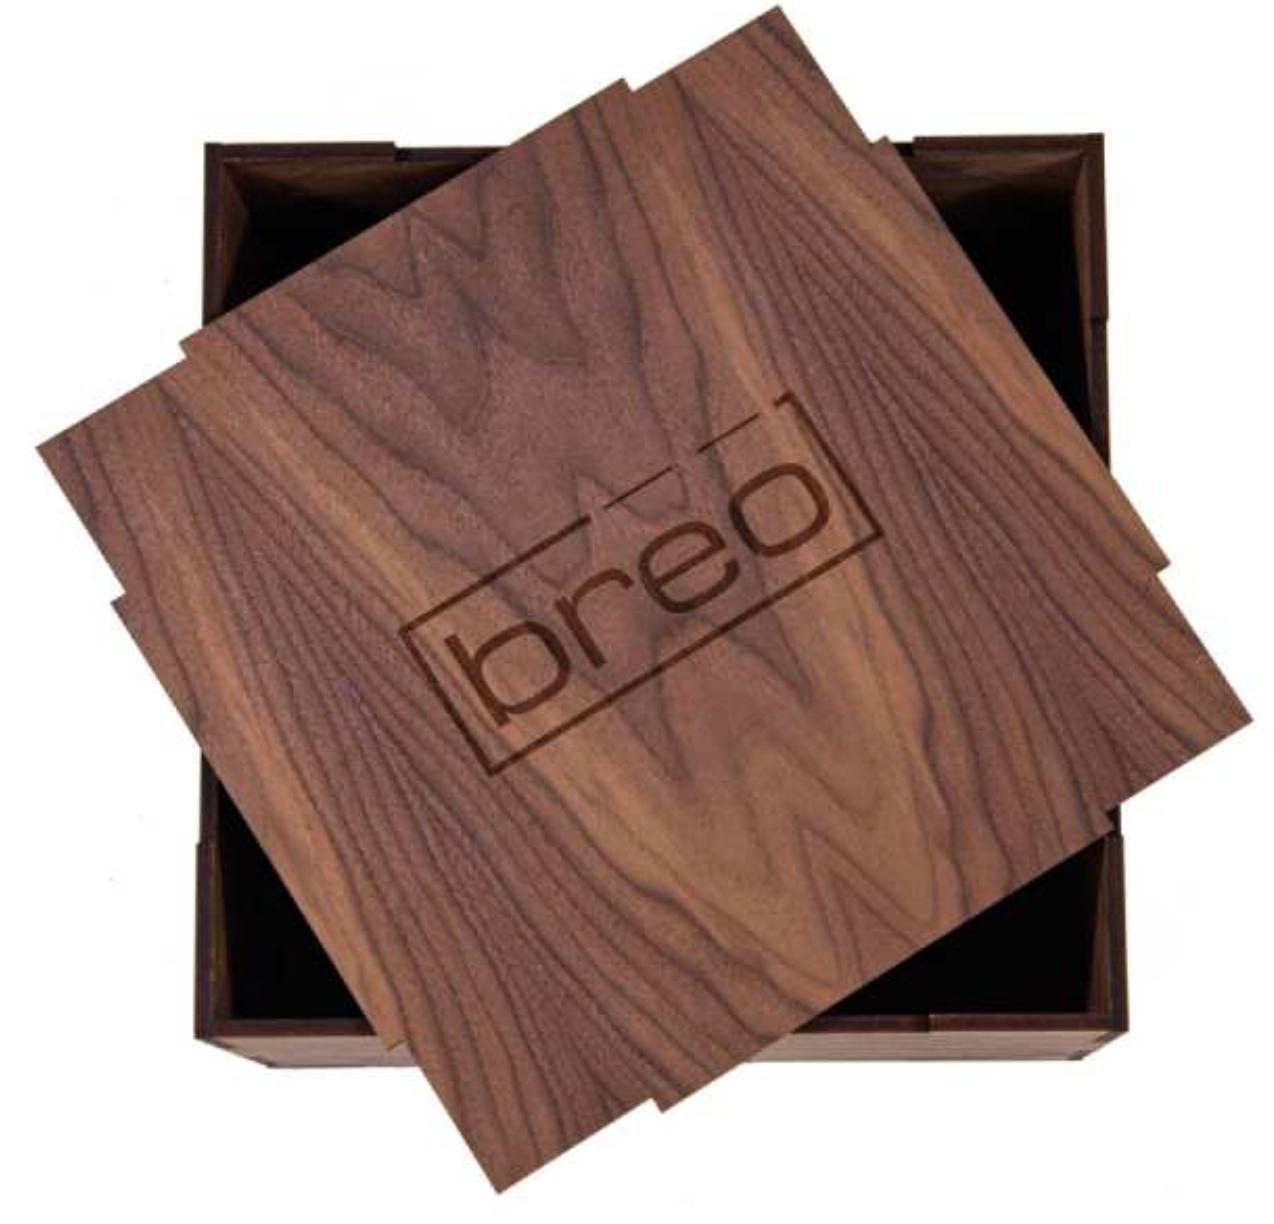 Limited Edition Anniversary Breo Box Spoiler #3!